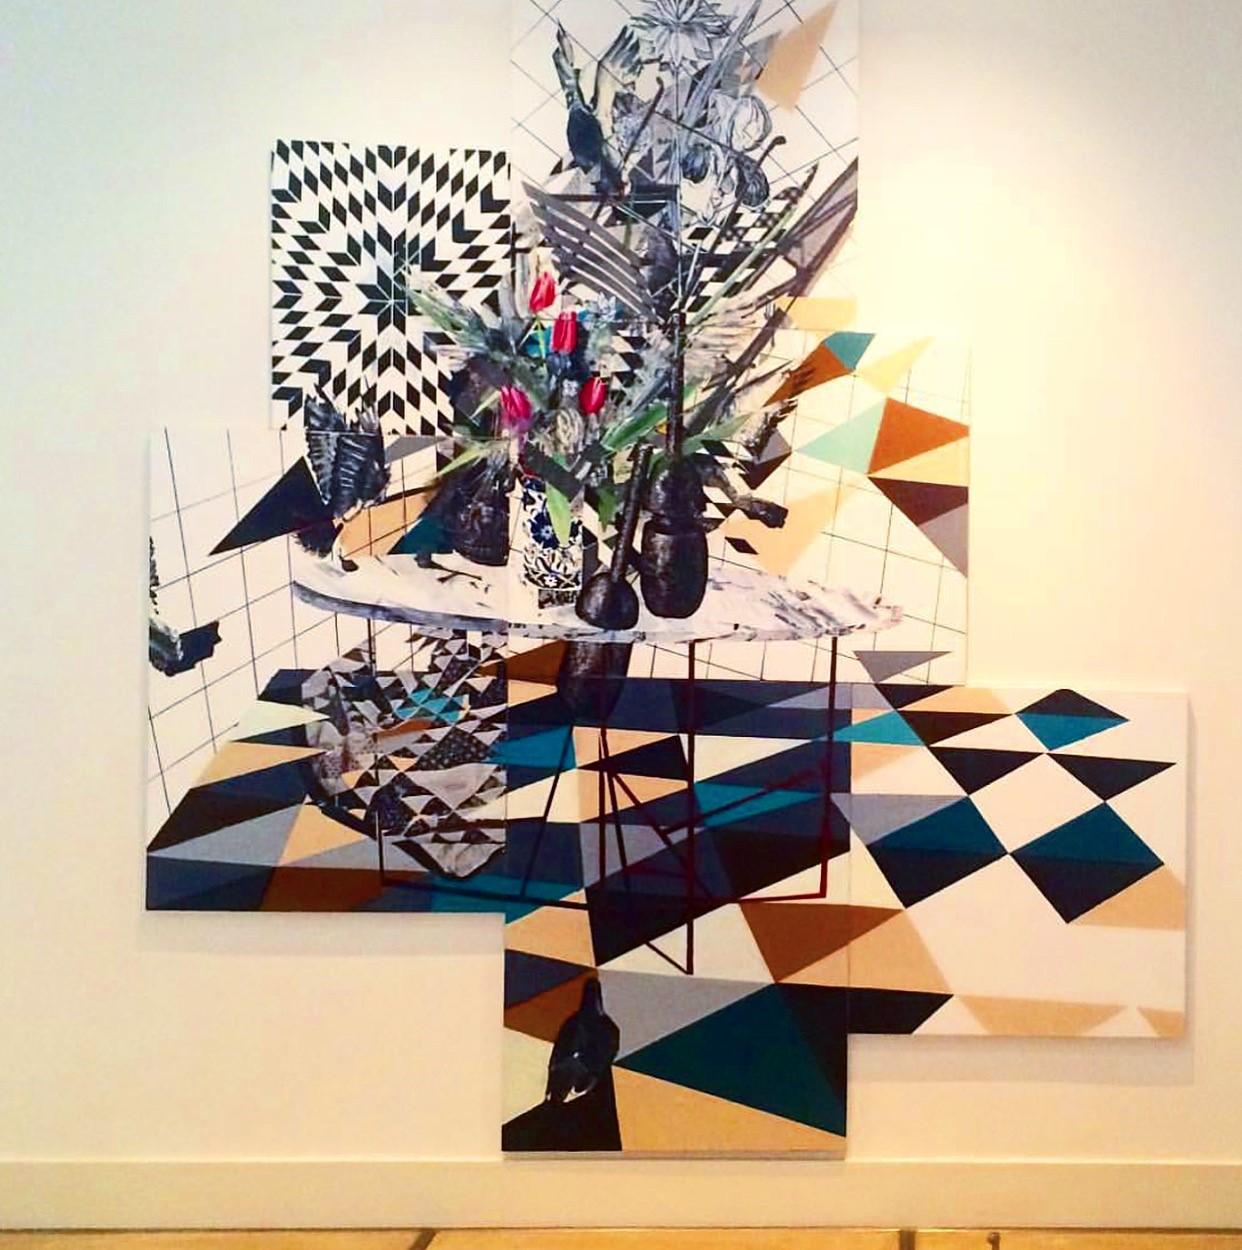 Maria-Brito_Art-Advisory-Francesca-Dimattio-2.jpg